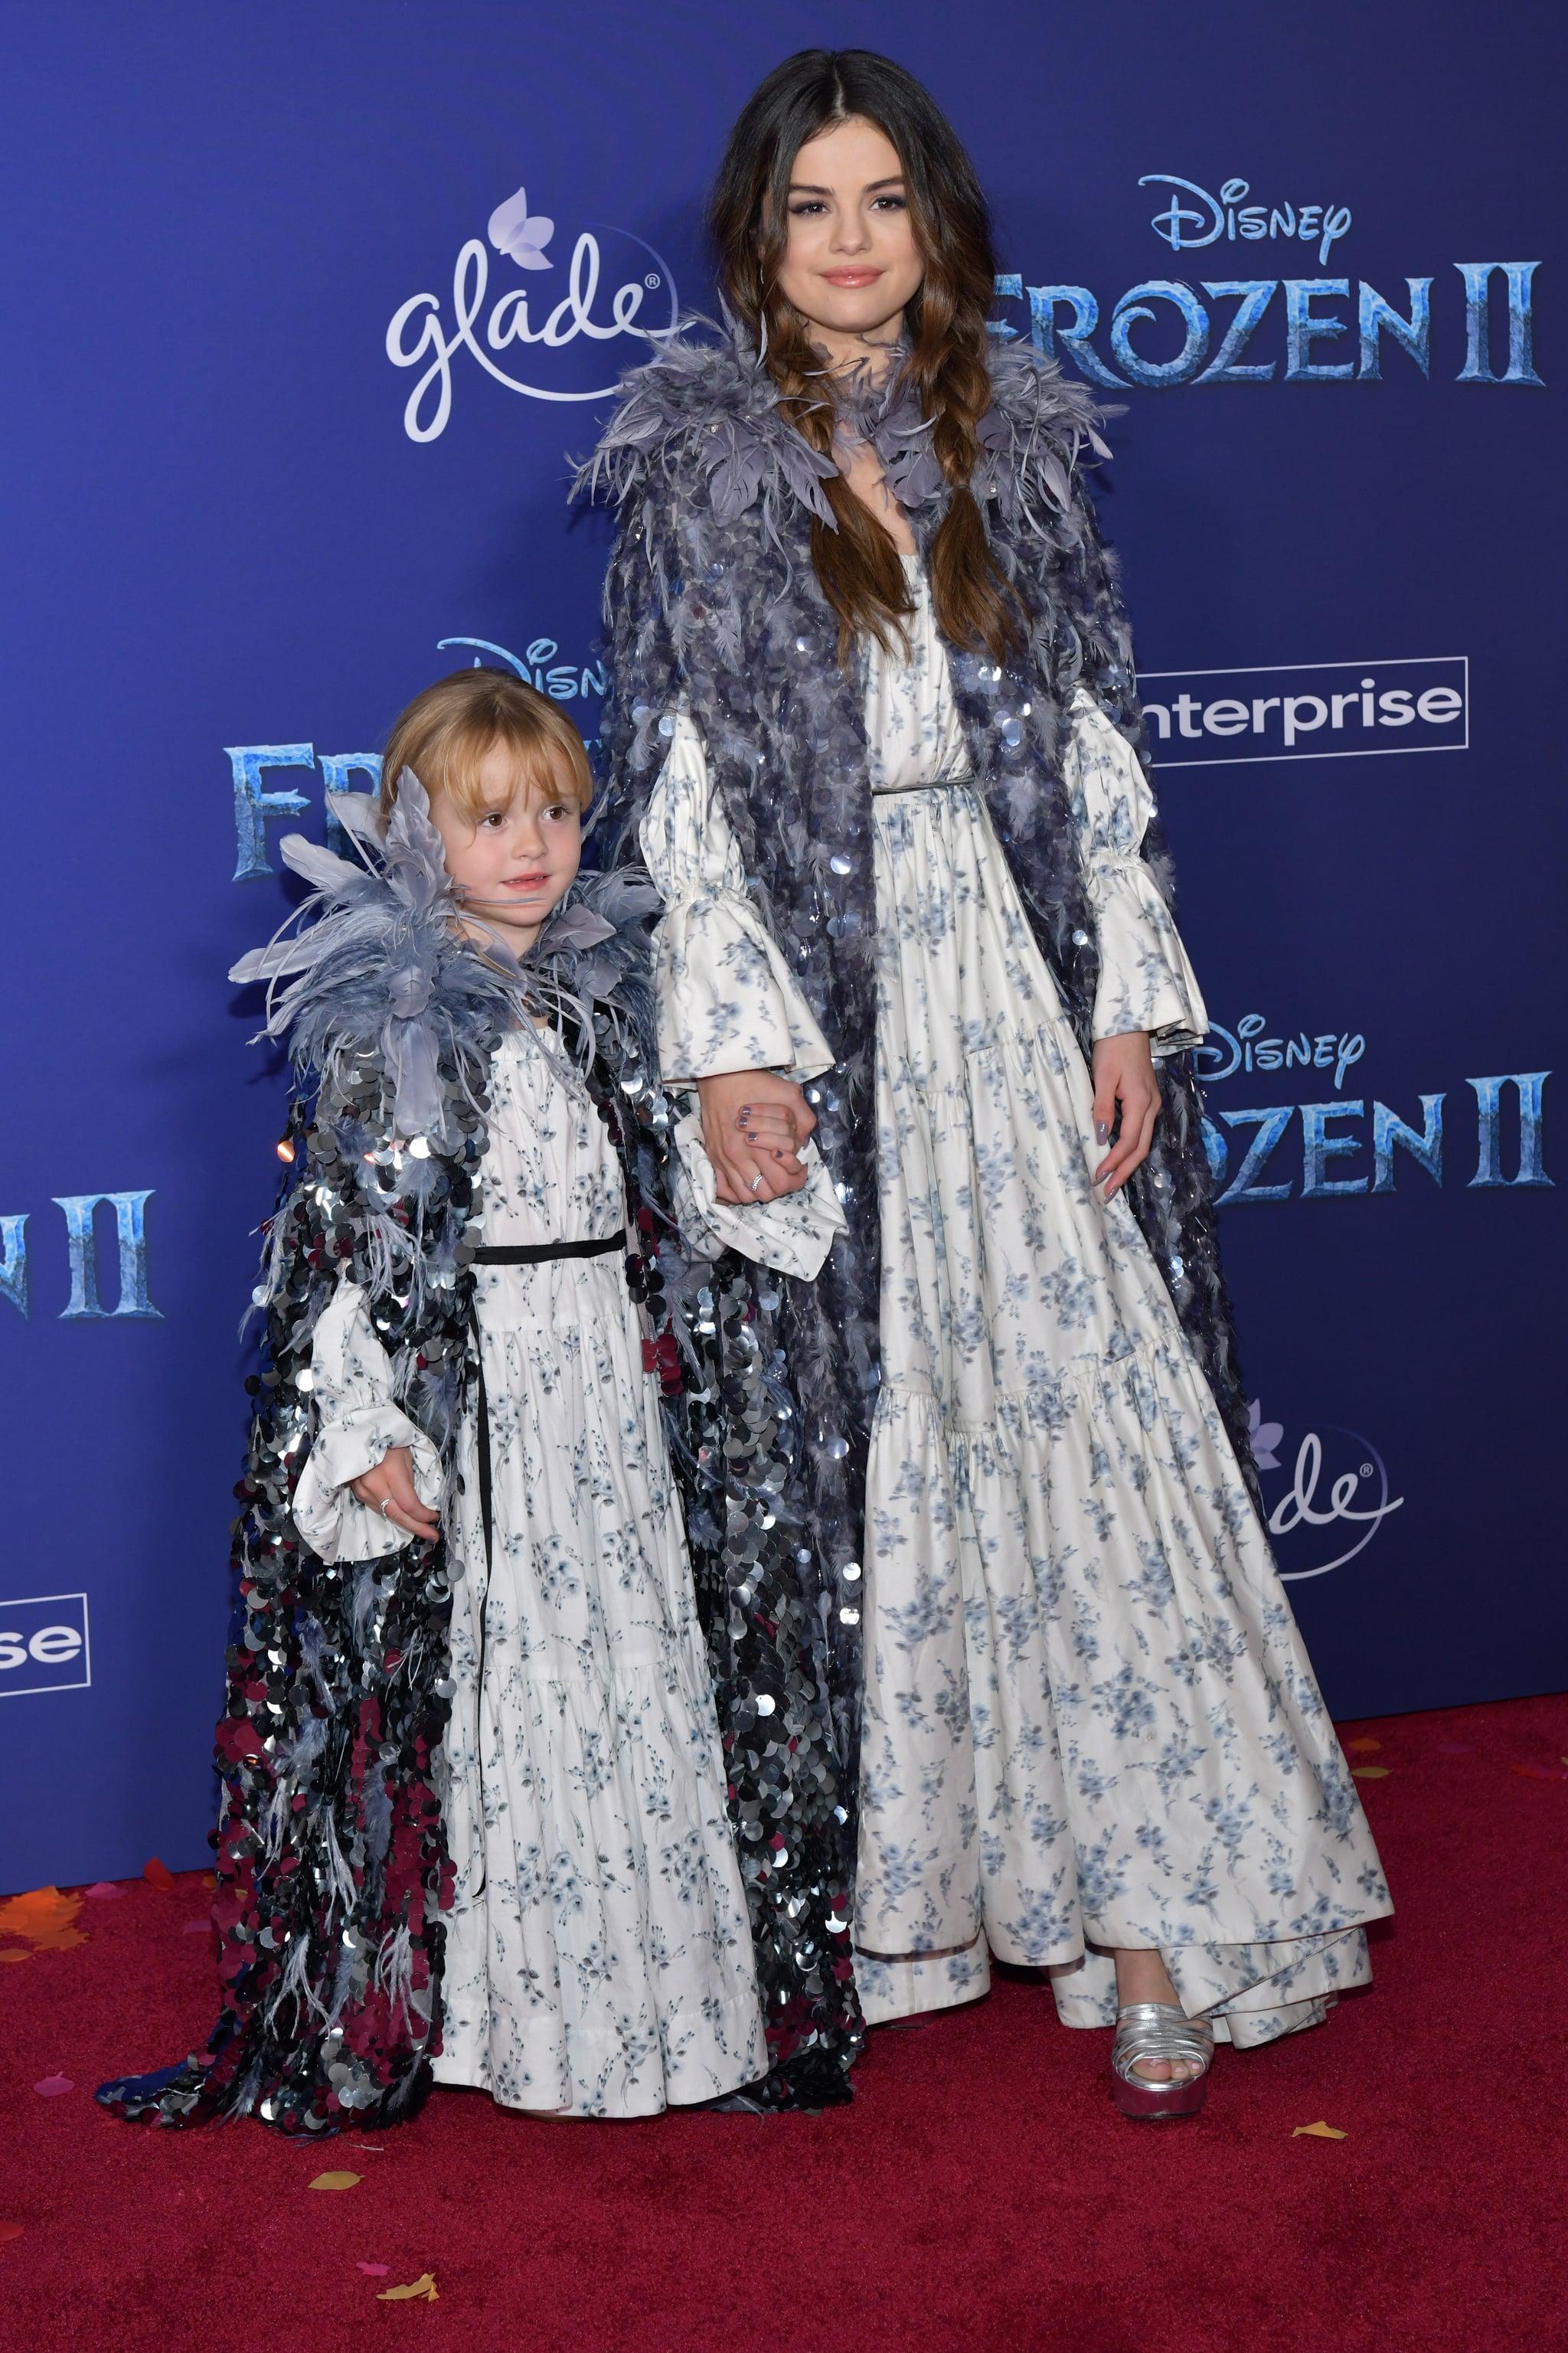 Selena Gomez Wore Marc Jacobs To The Frozen 2 Premiere Popsugar Fashion